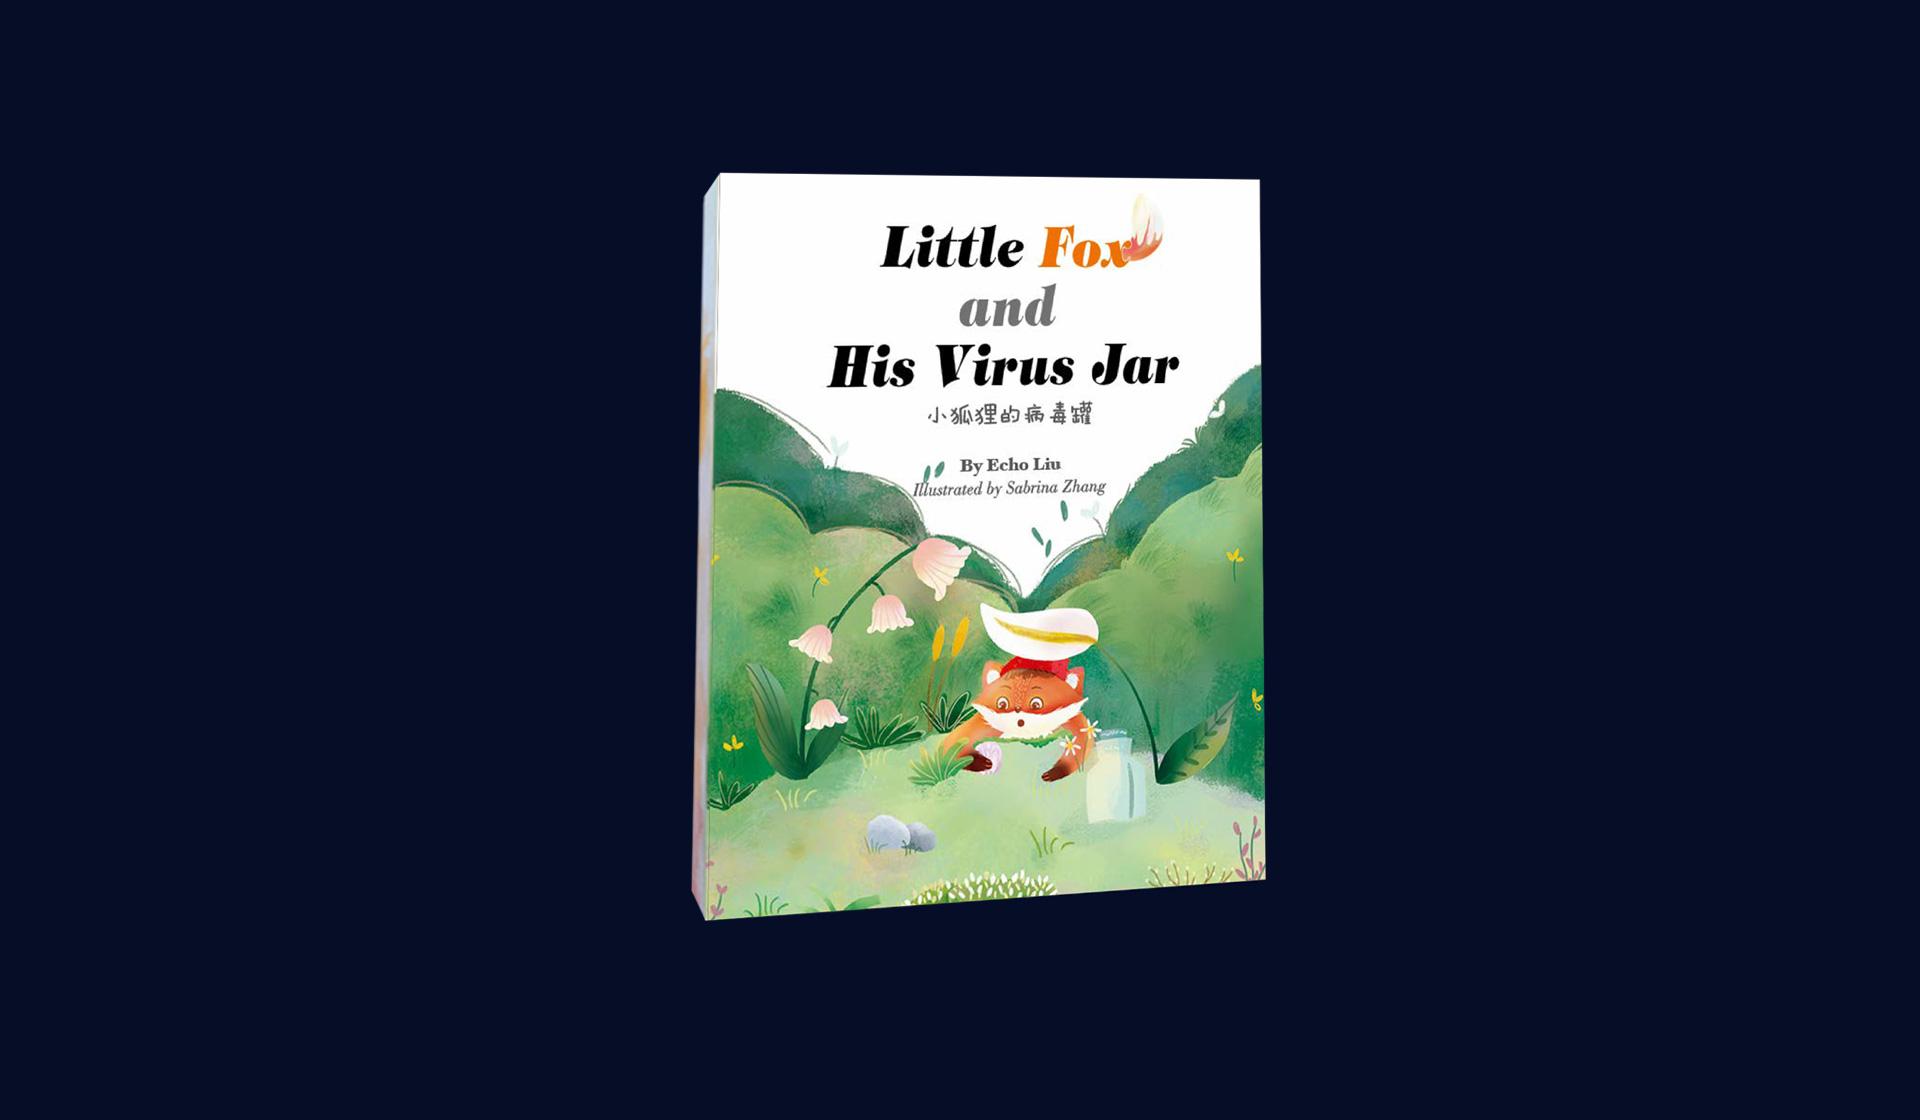 Little fox and his virus jar